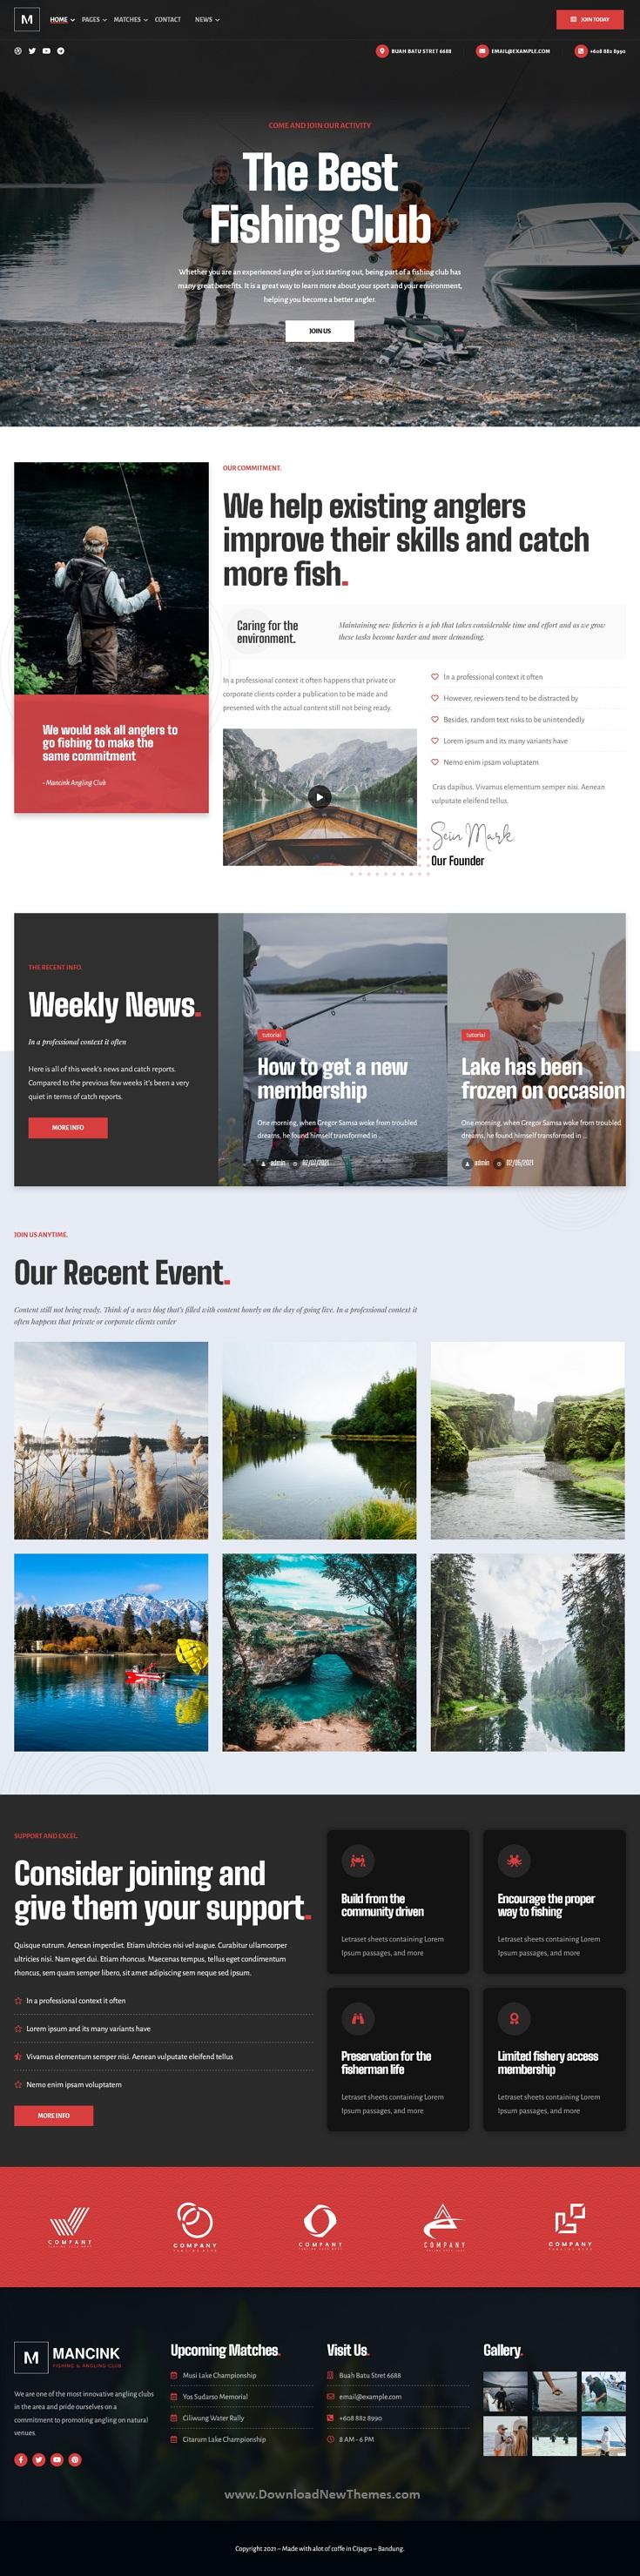 Fishing and Angling WordPress Theme